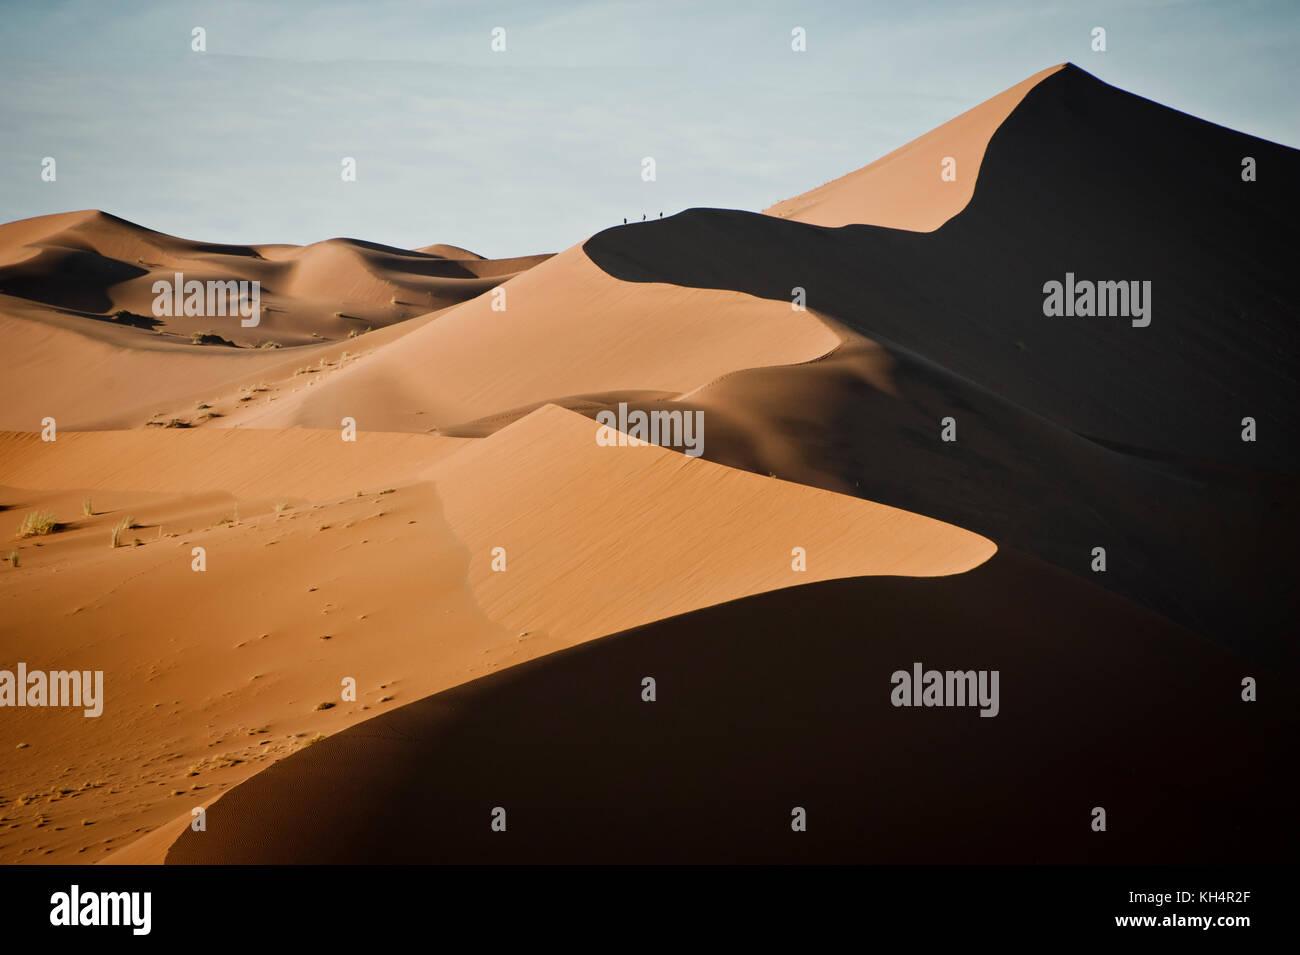 Dunes of Sossusvlei, Namib Desert, Namibia, Africa. - Stock Image